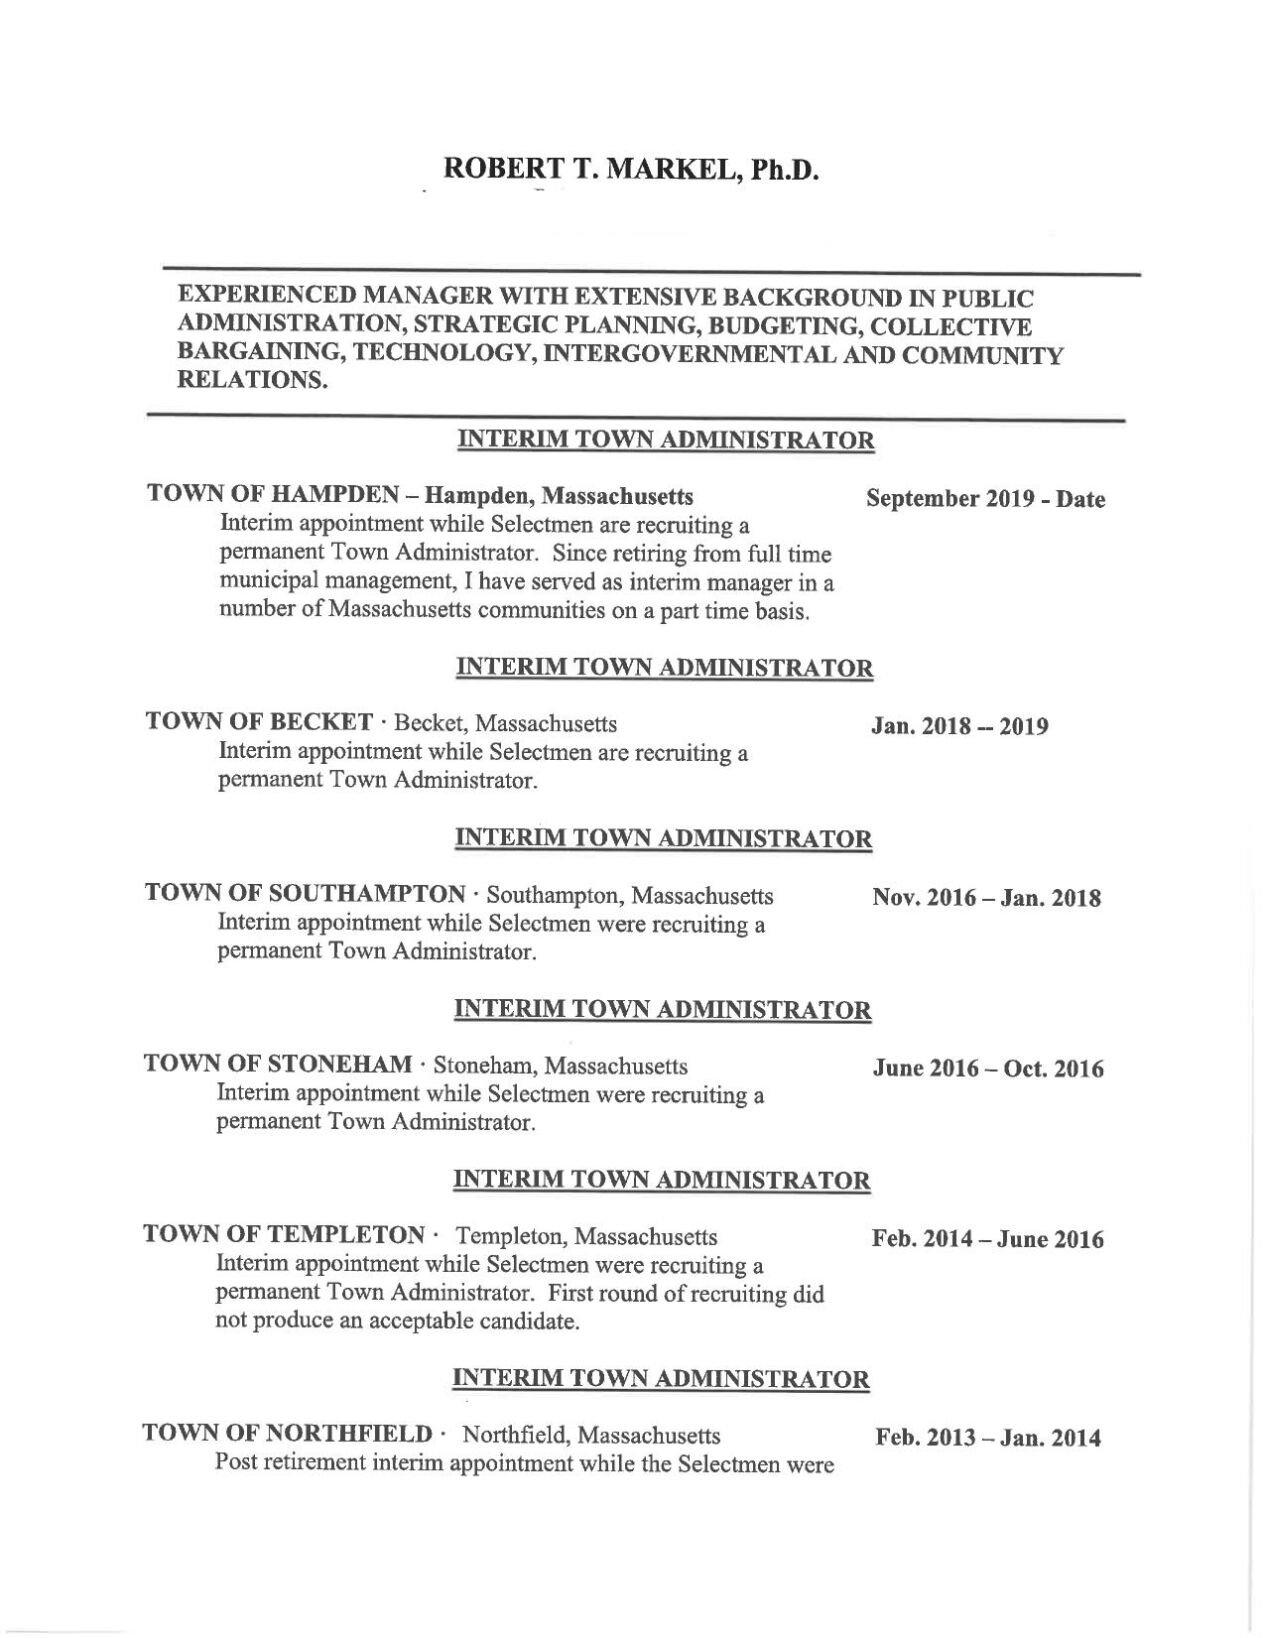 MARKEL RESUME.pdf